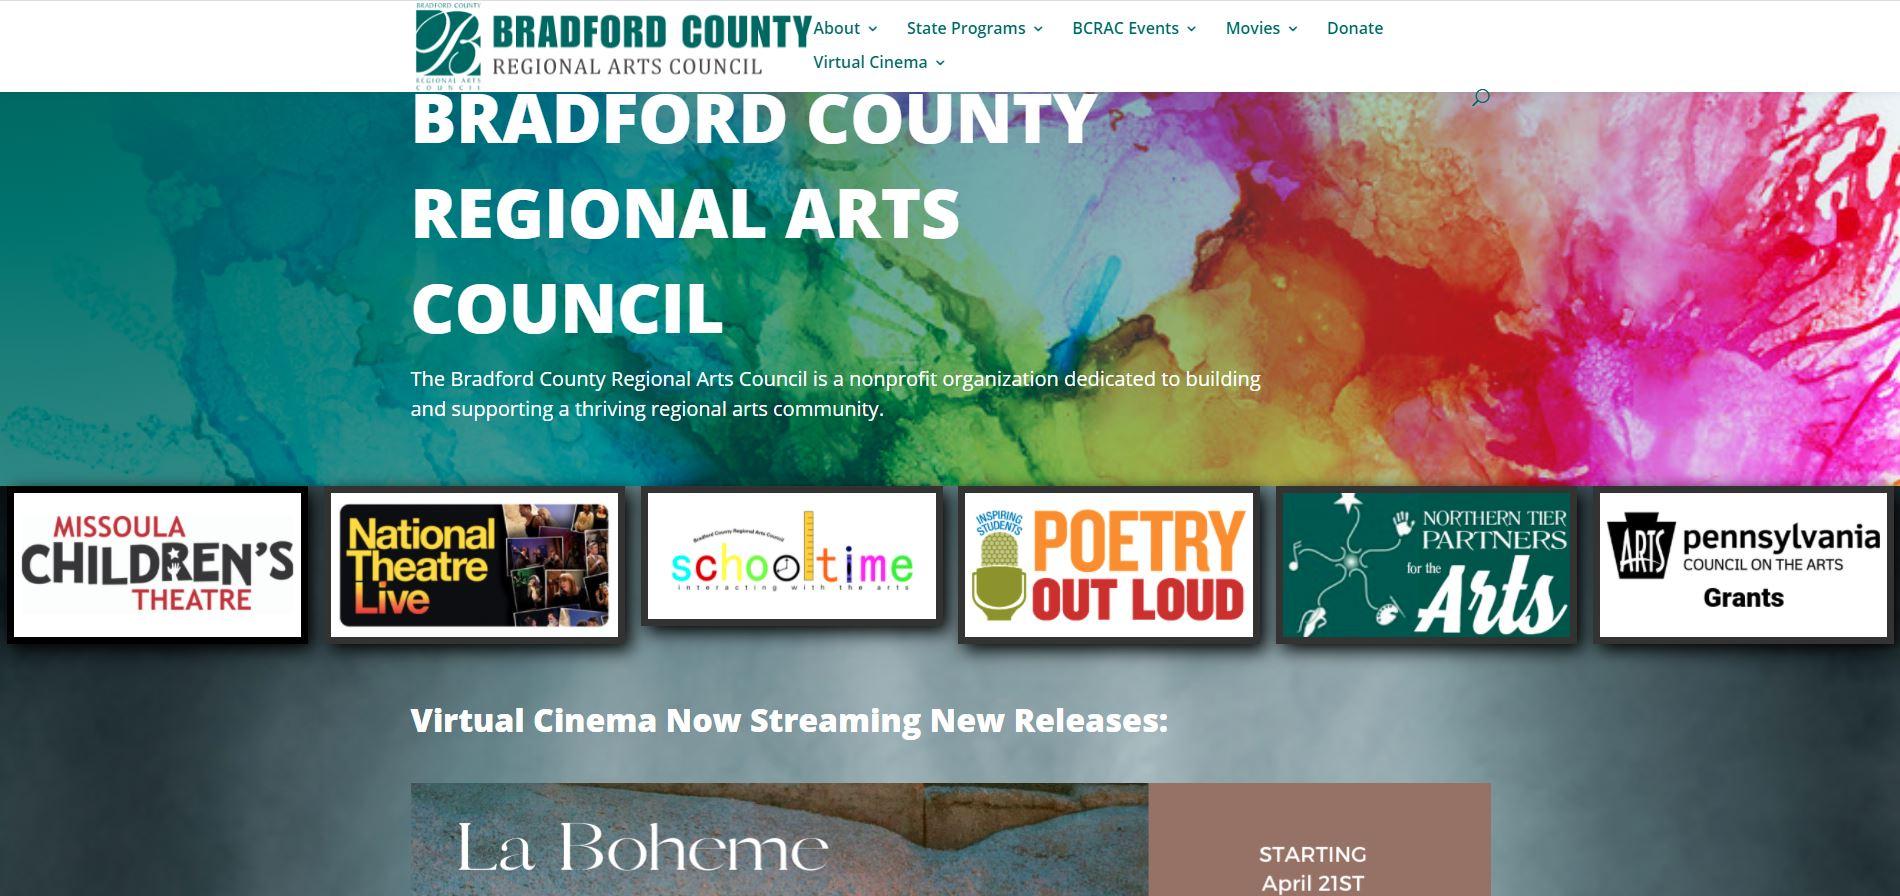 bradford county regional arts council